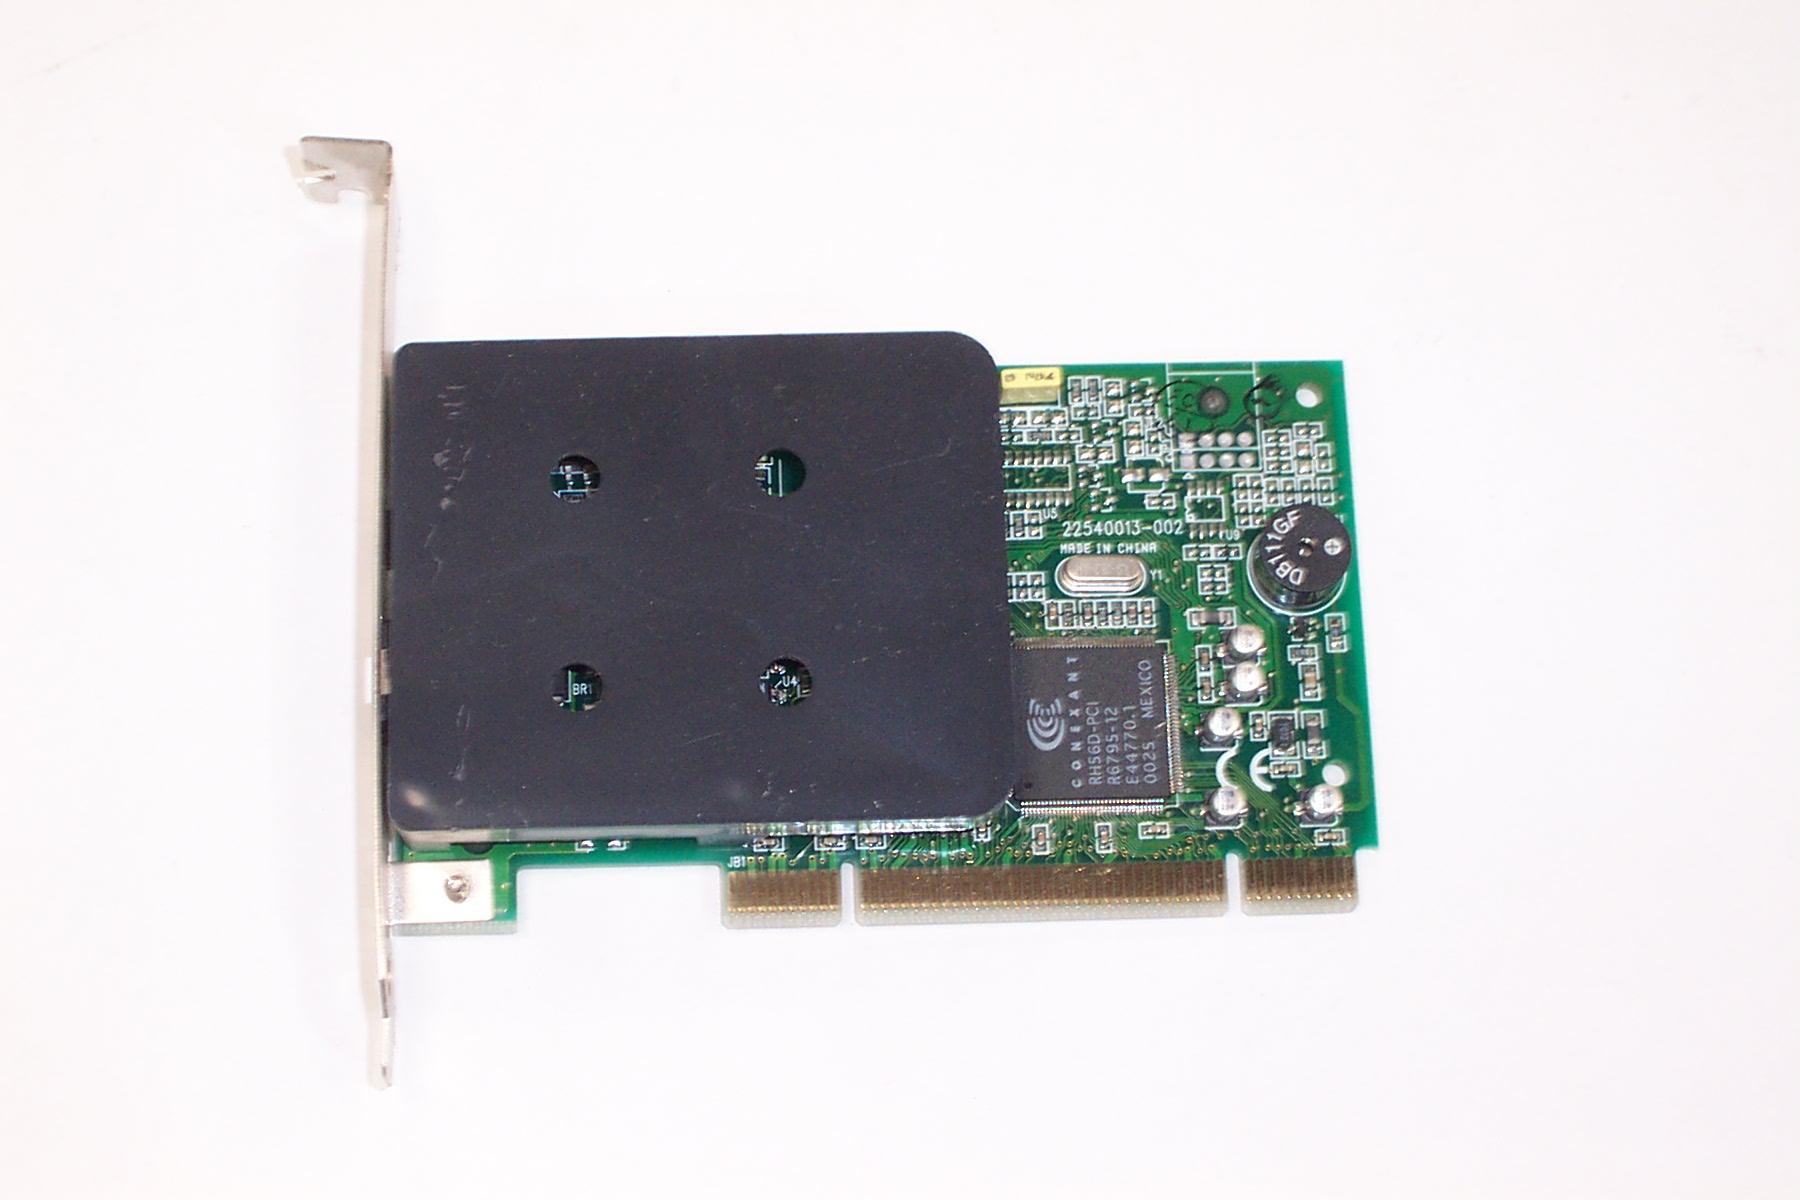 DOWNLOAD DRIVERS: CONEXANT RH56D PCI MODEM